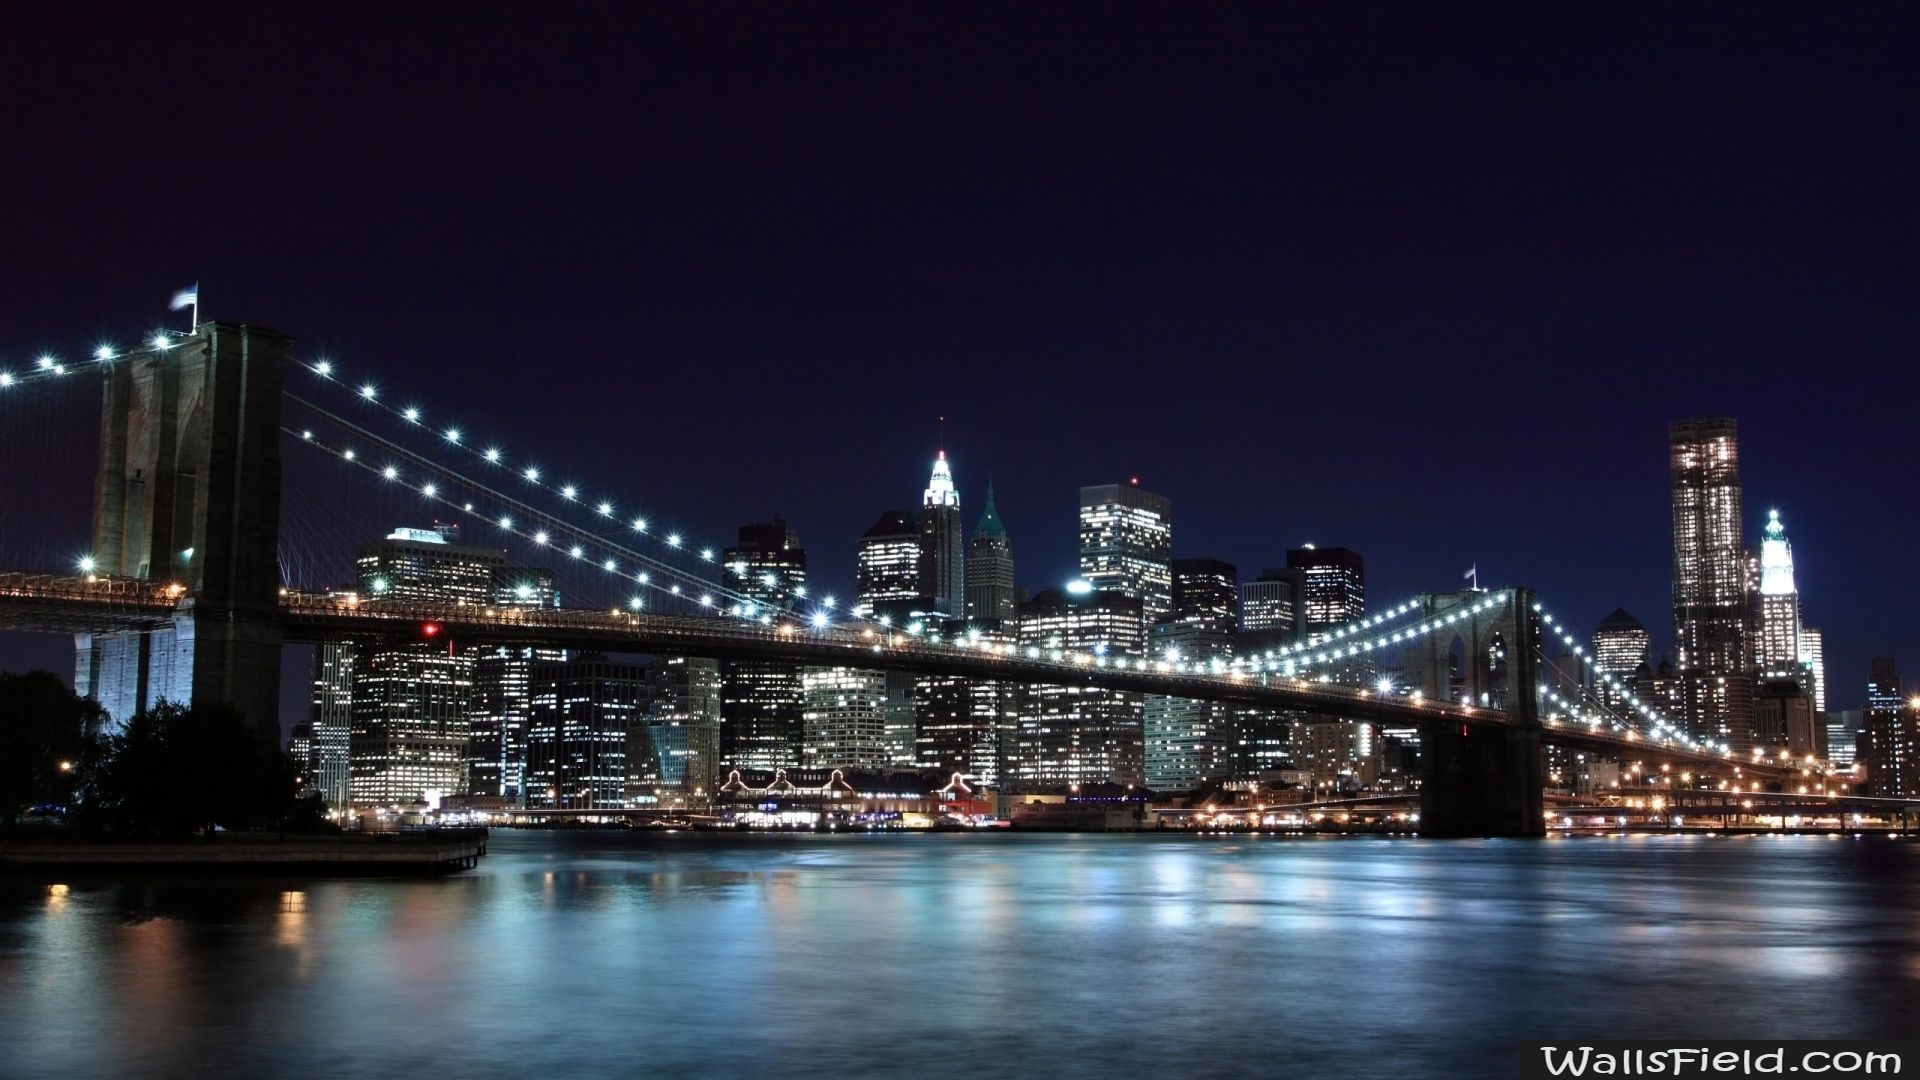 New York City Wallsfield Com Free Hd Wallpapers Brooklyn Bridge New York Bridge Wallpaper New York Wallpaper